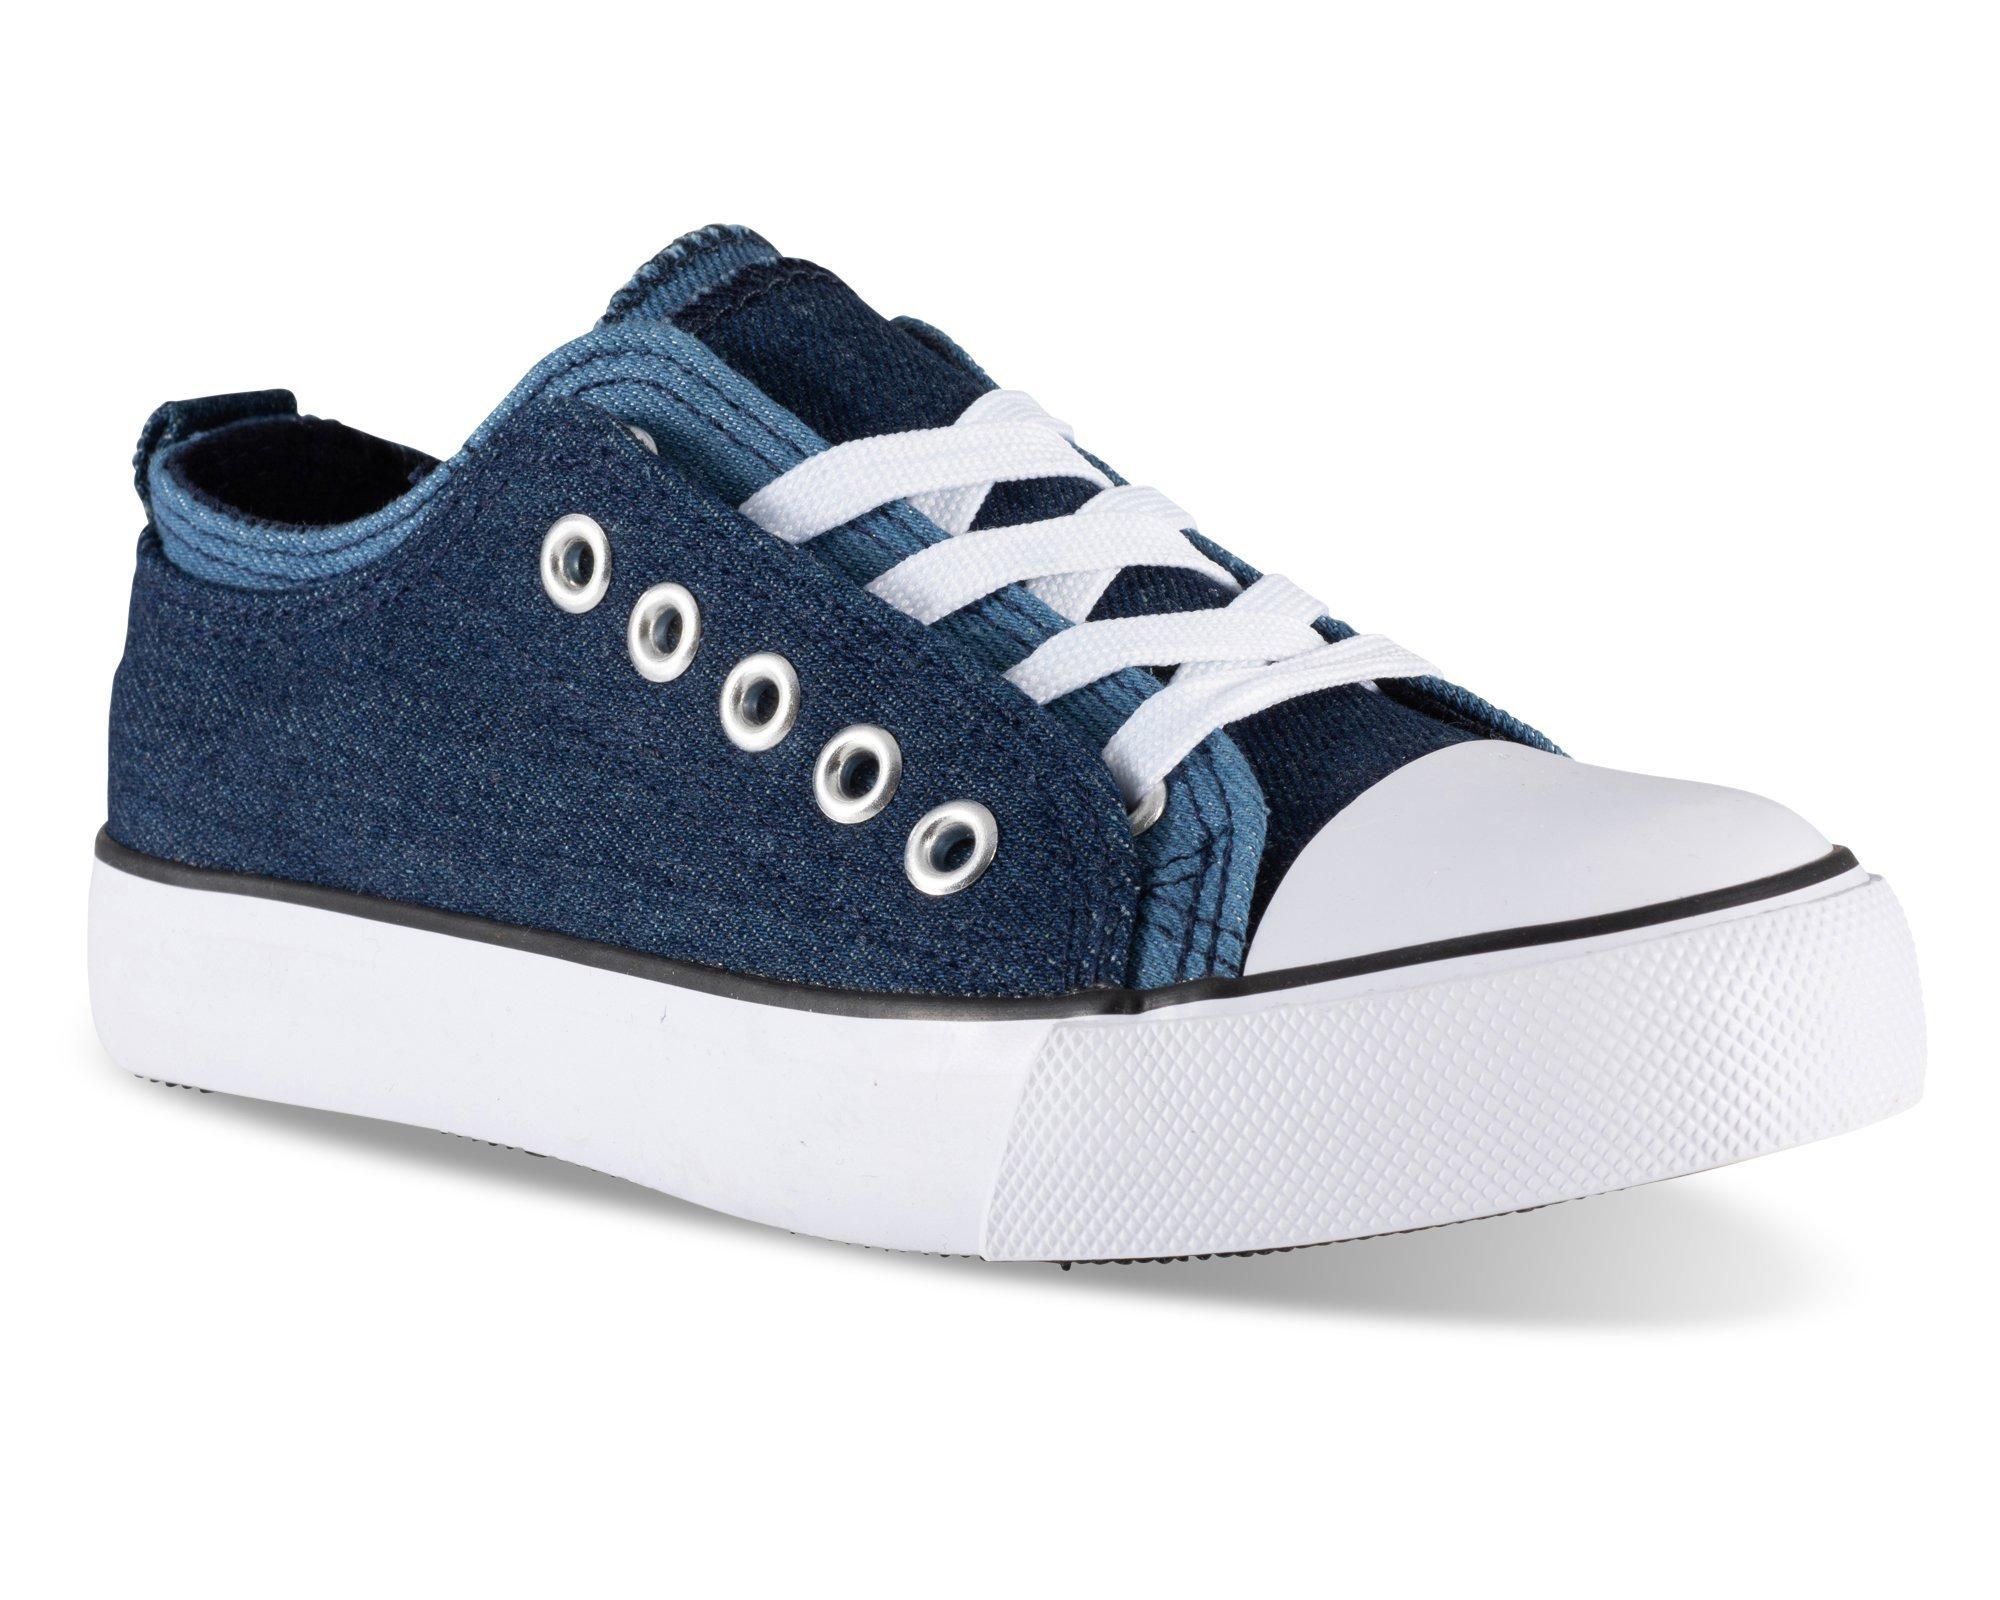 Twisted Girl's Canvas KIX Double Upper Lo-Top Sneaker - Denim/Denim, Size 13